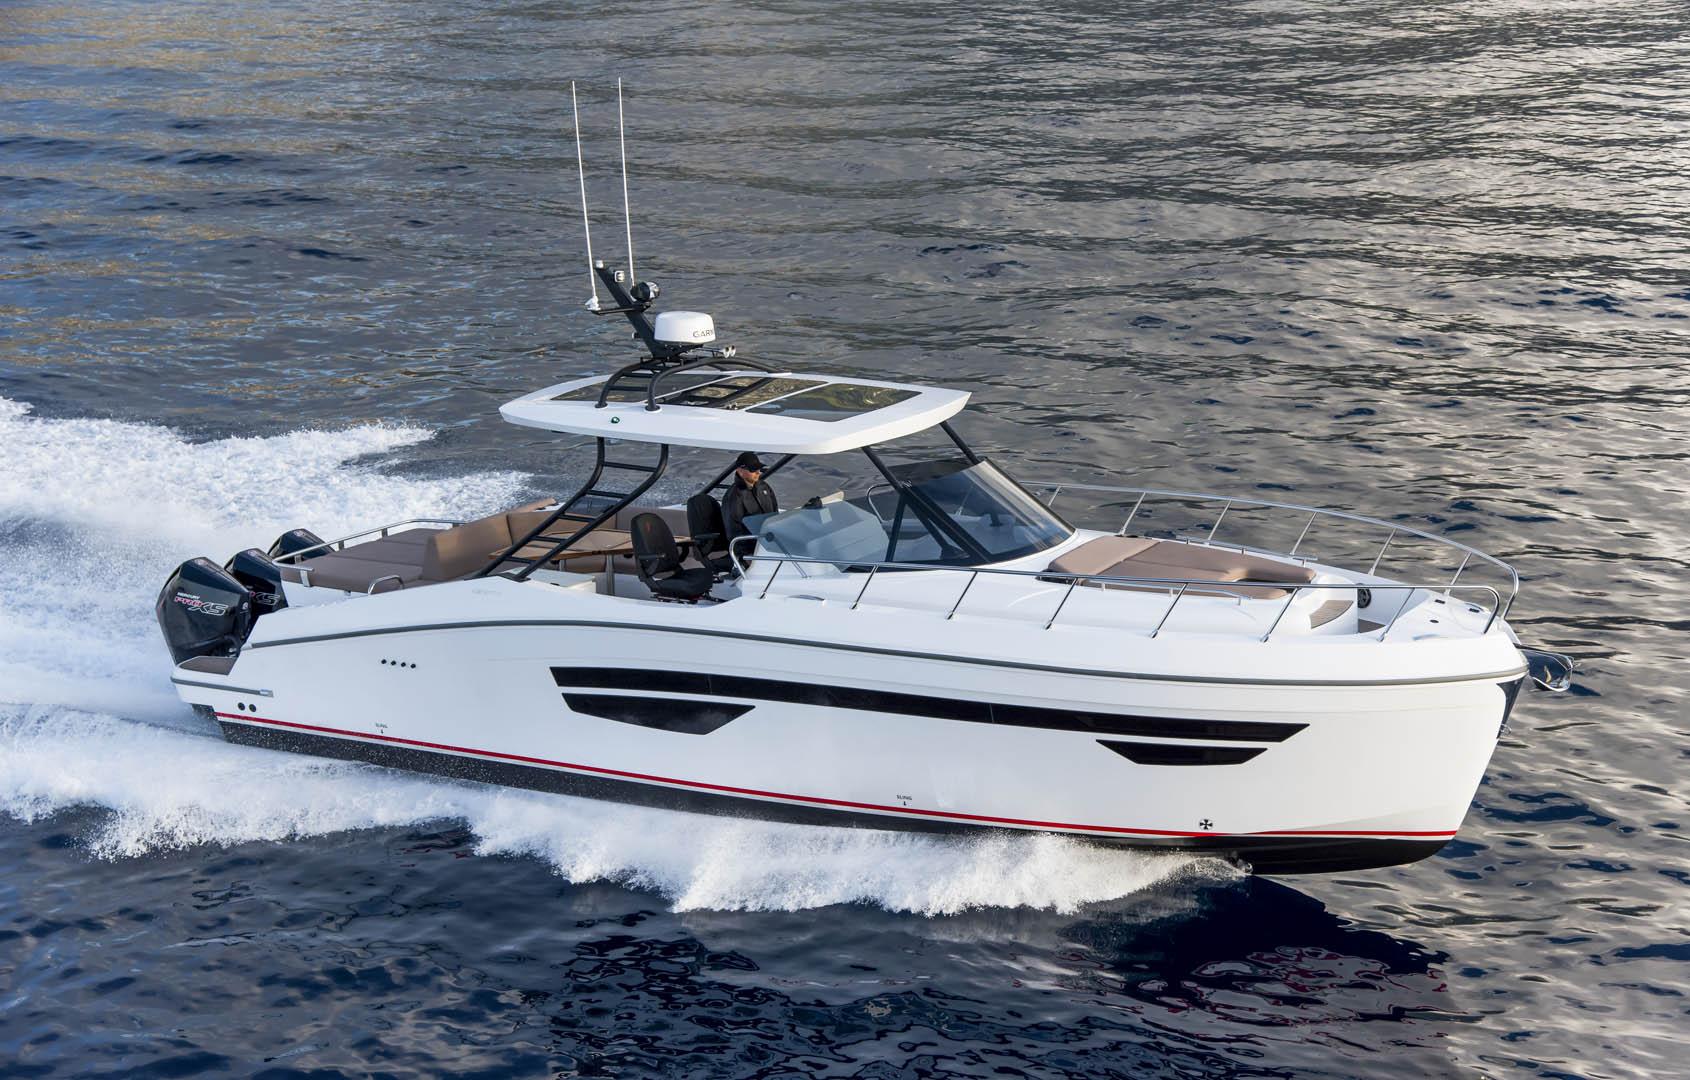 Oryx 379 - The Next Generation Cruiser